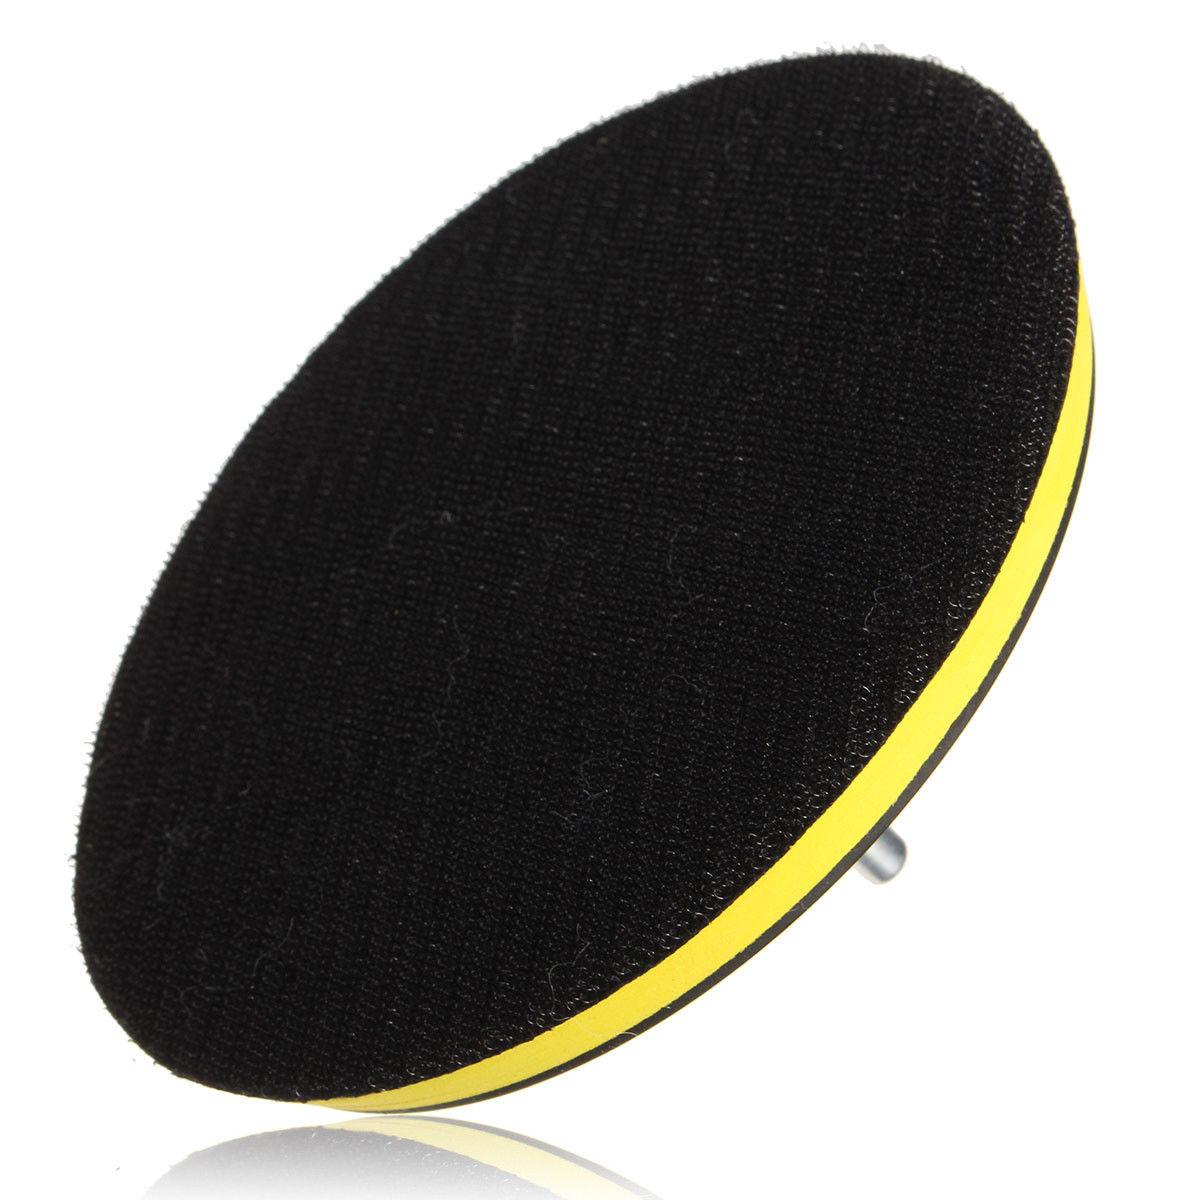 11x polierschwamm polierpads set cf 150mm polierscheibe auto polierpad polierset ebay. Black Bedroom Furniture Sets. Home Design Ideas